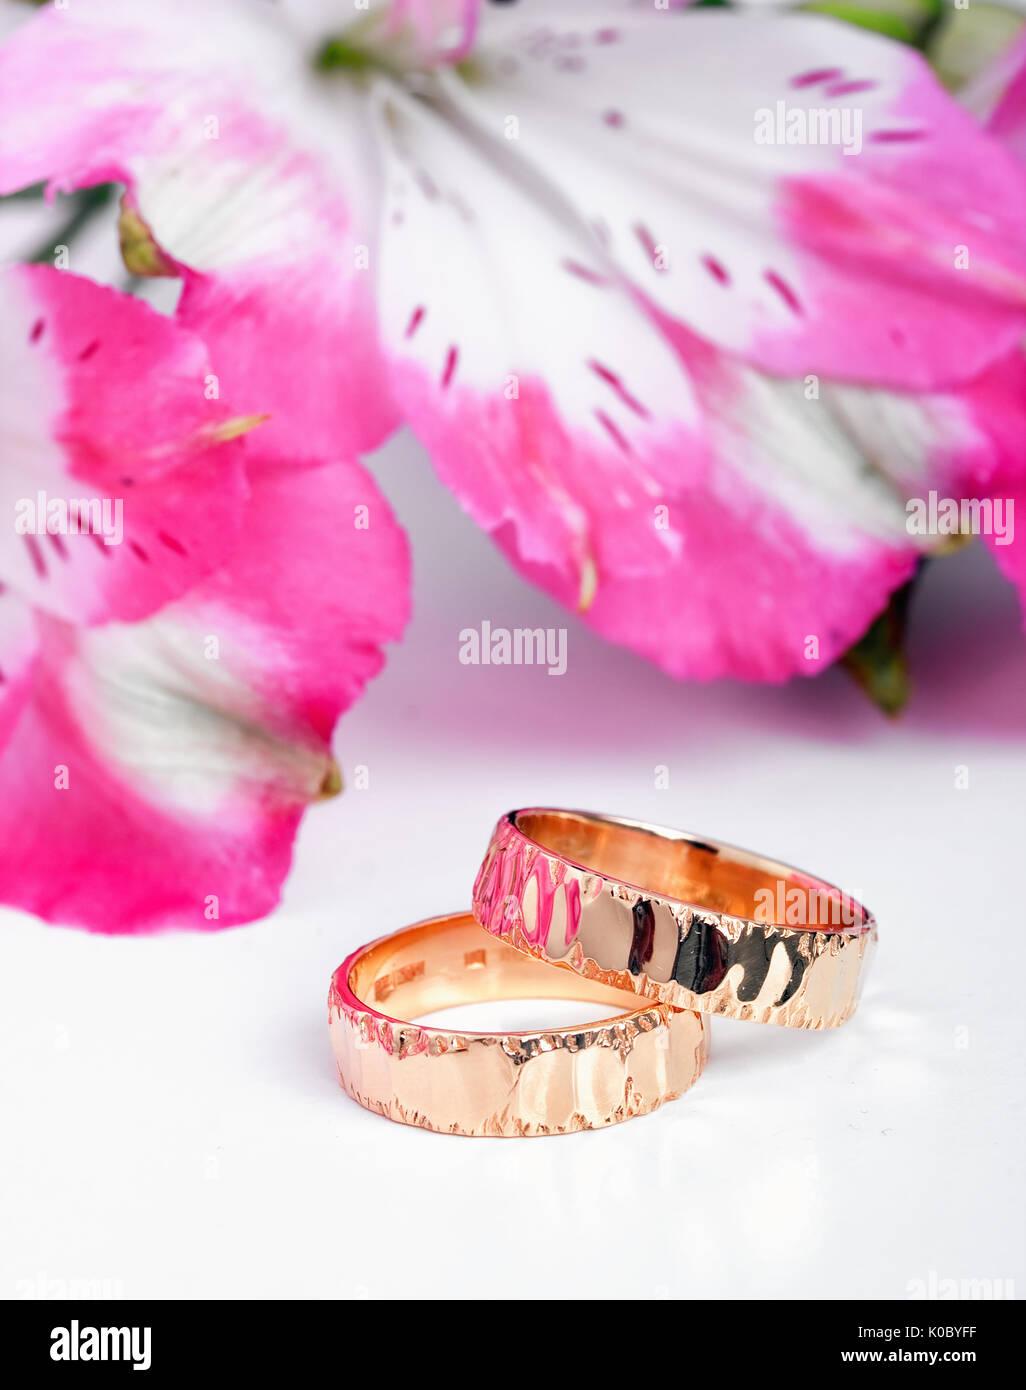 Golden Wedding Rings Reflection Stock Photos & Golden Wedding Rings ...